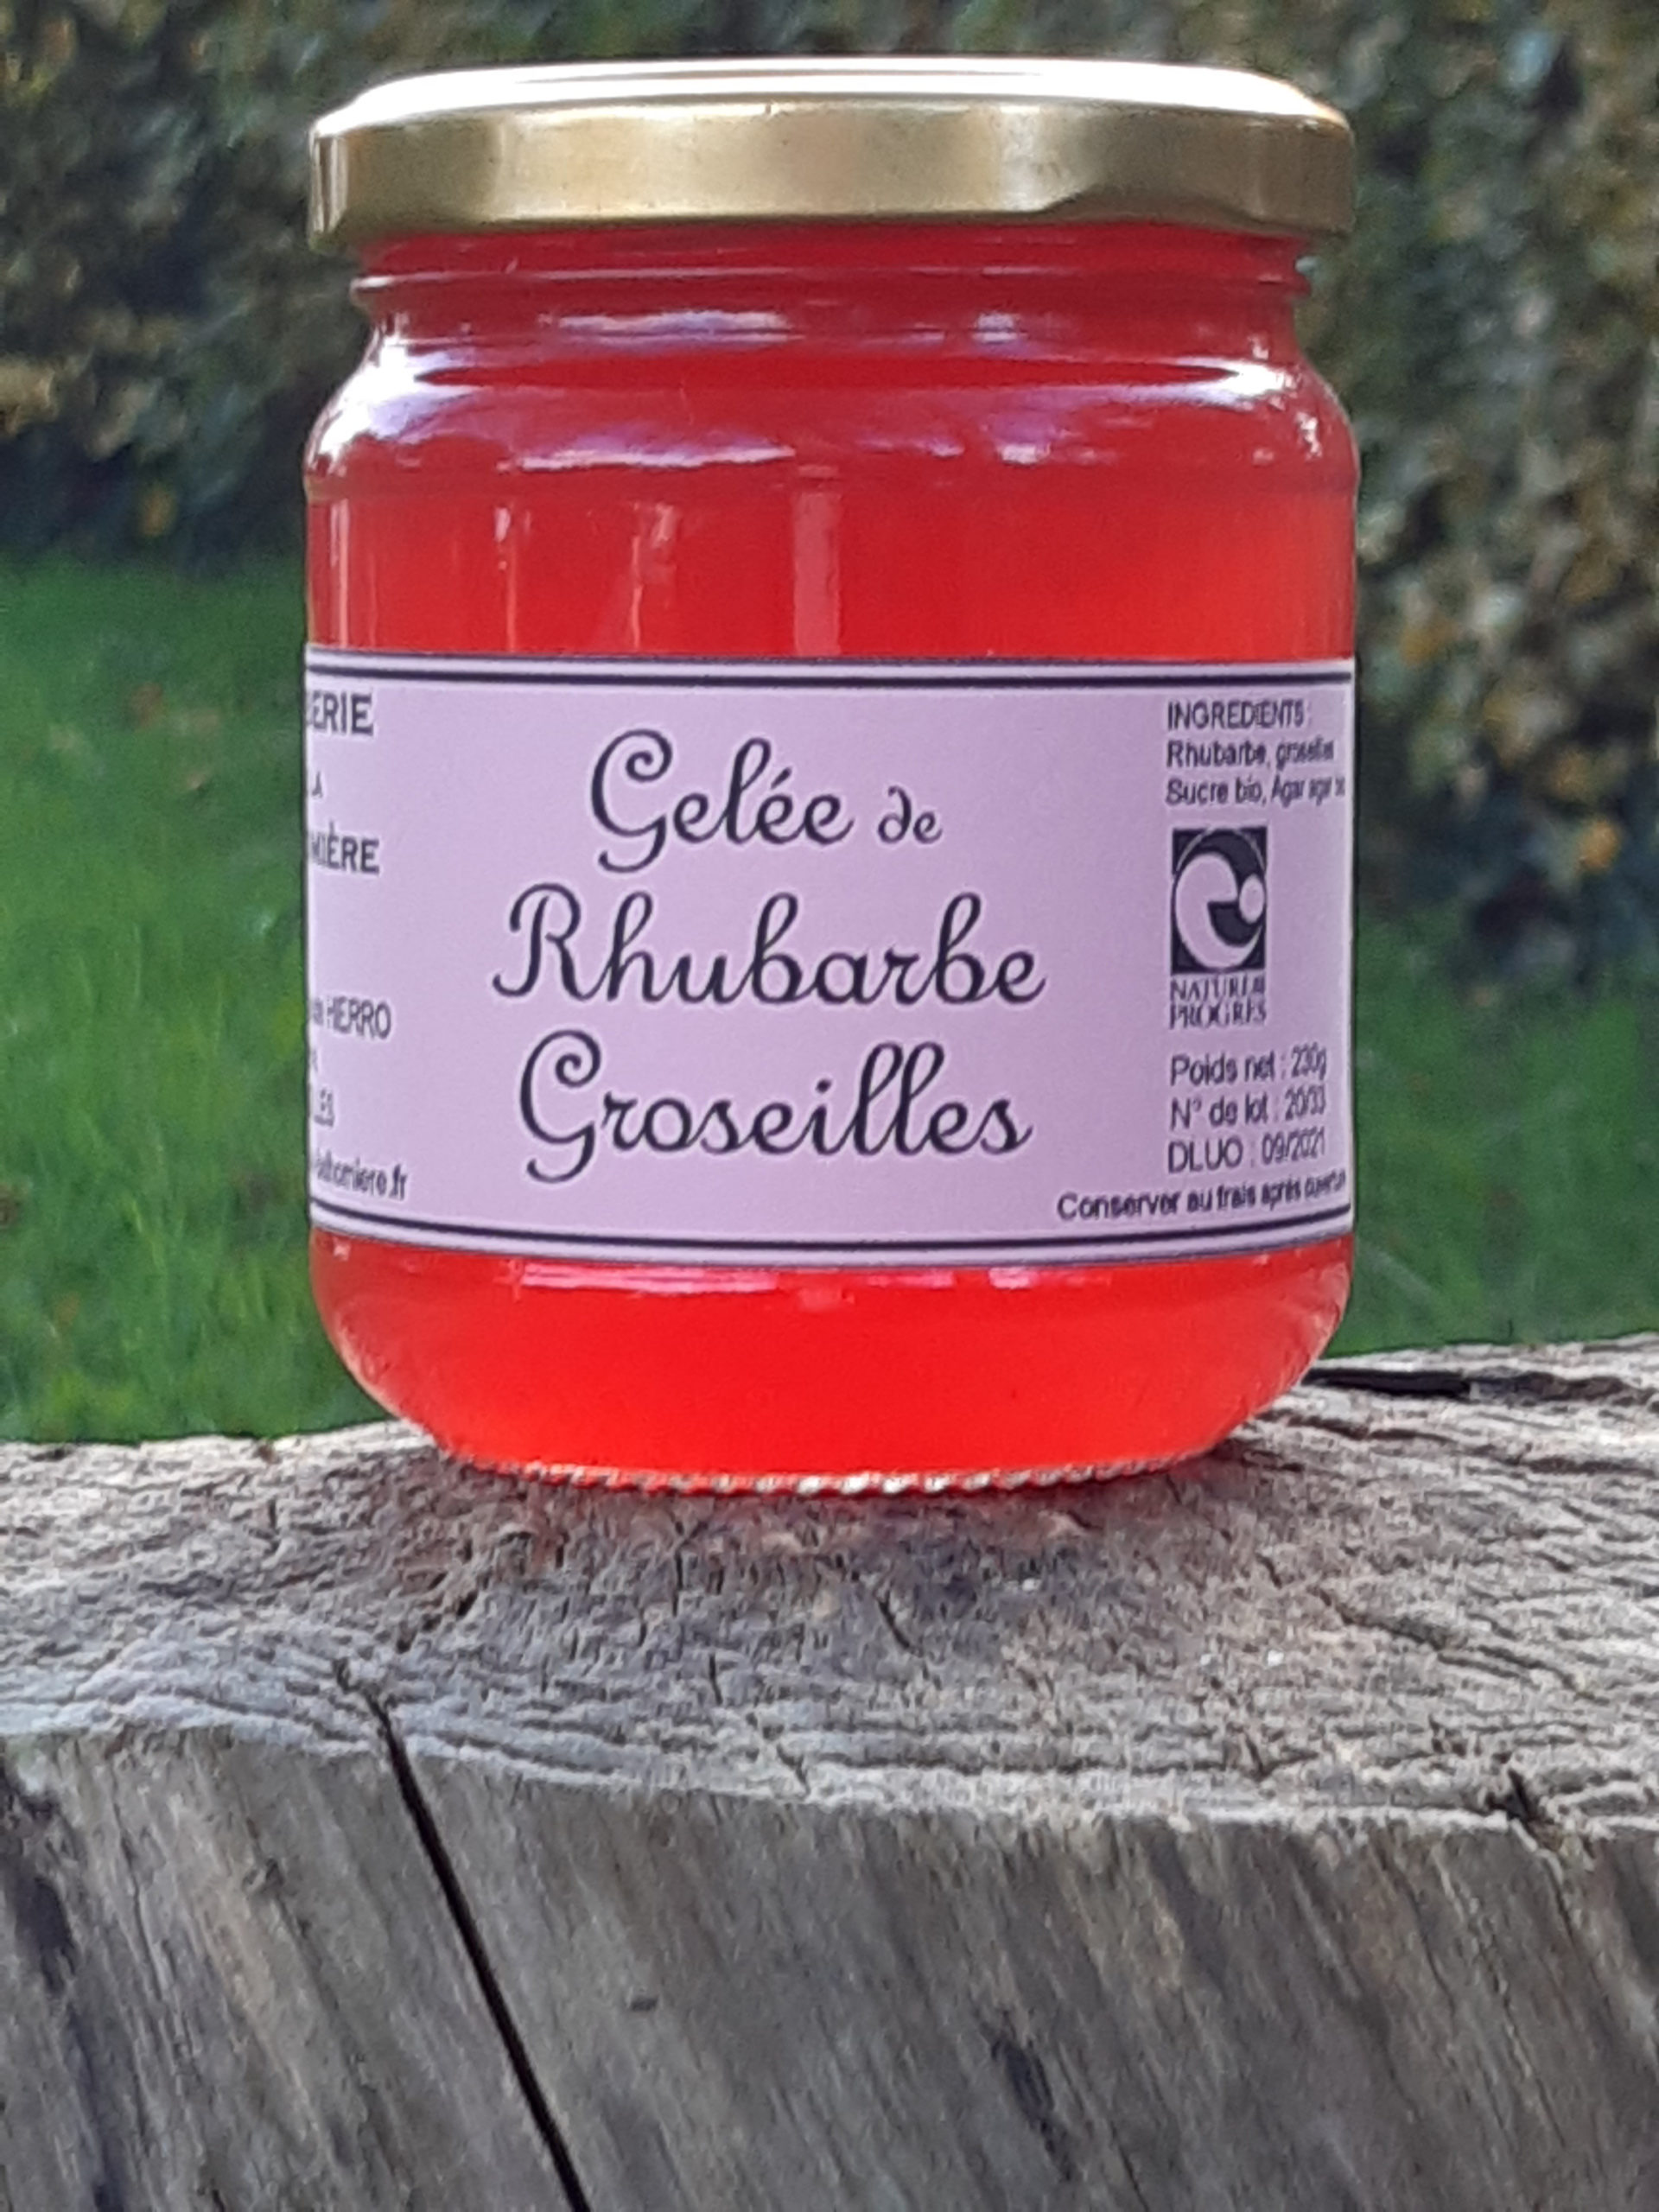 Gelée de rhubarbe et groseilles